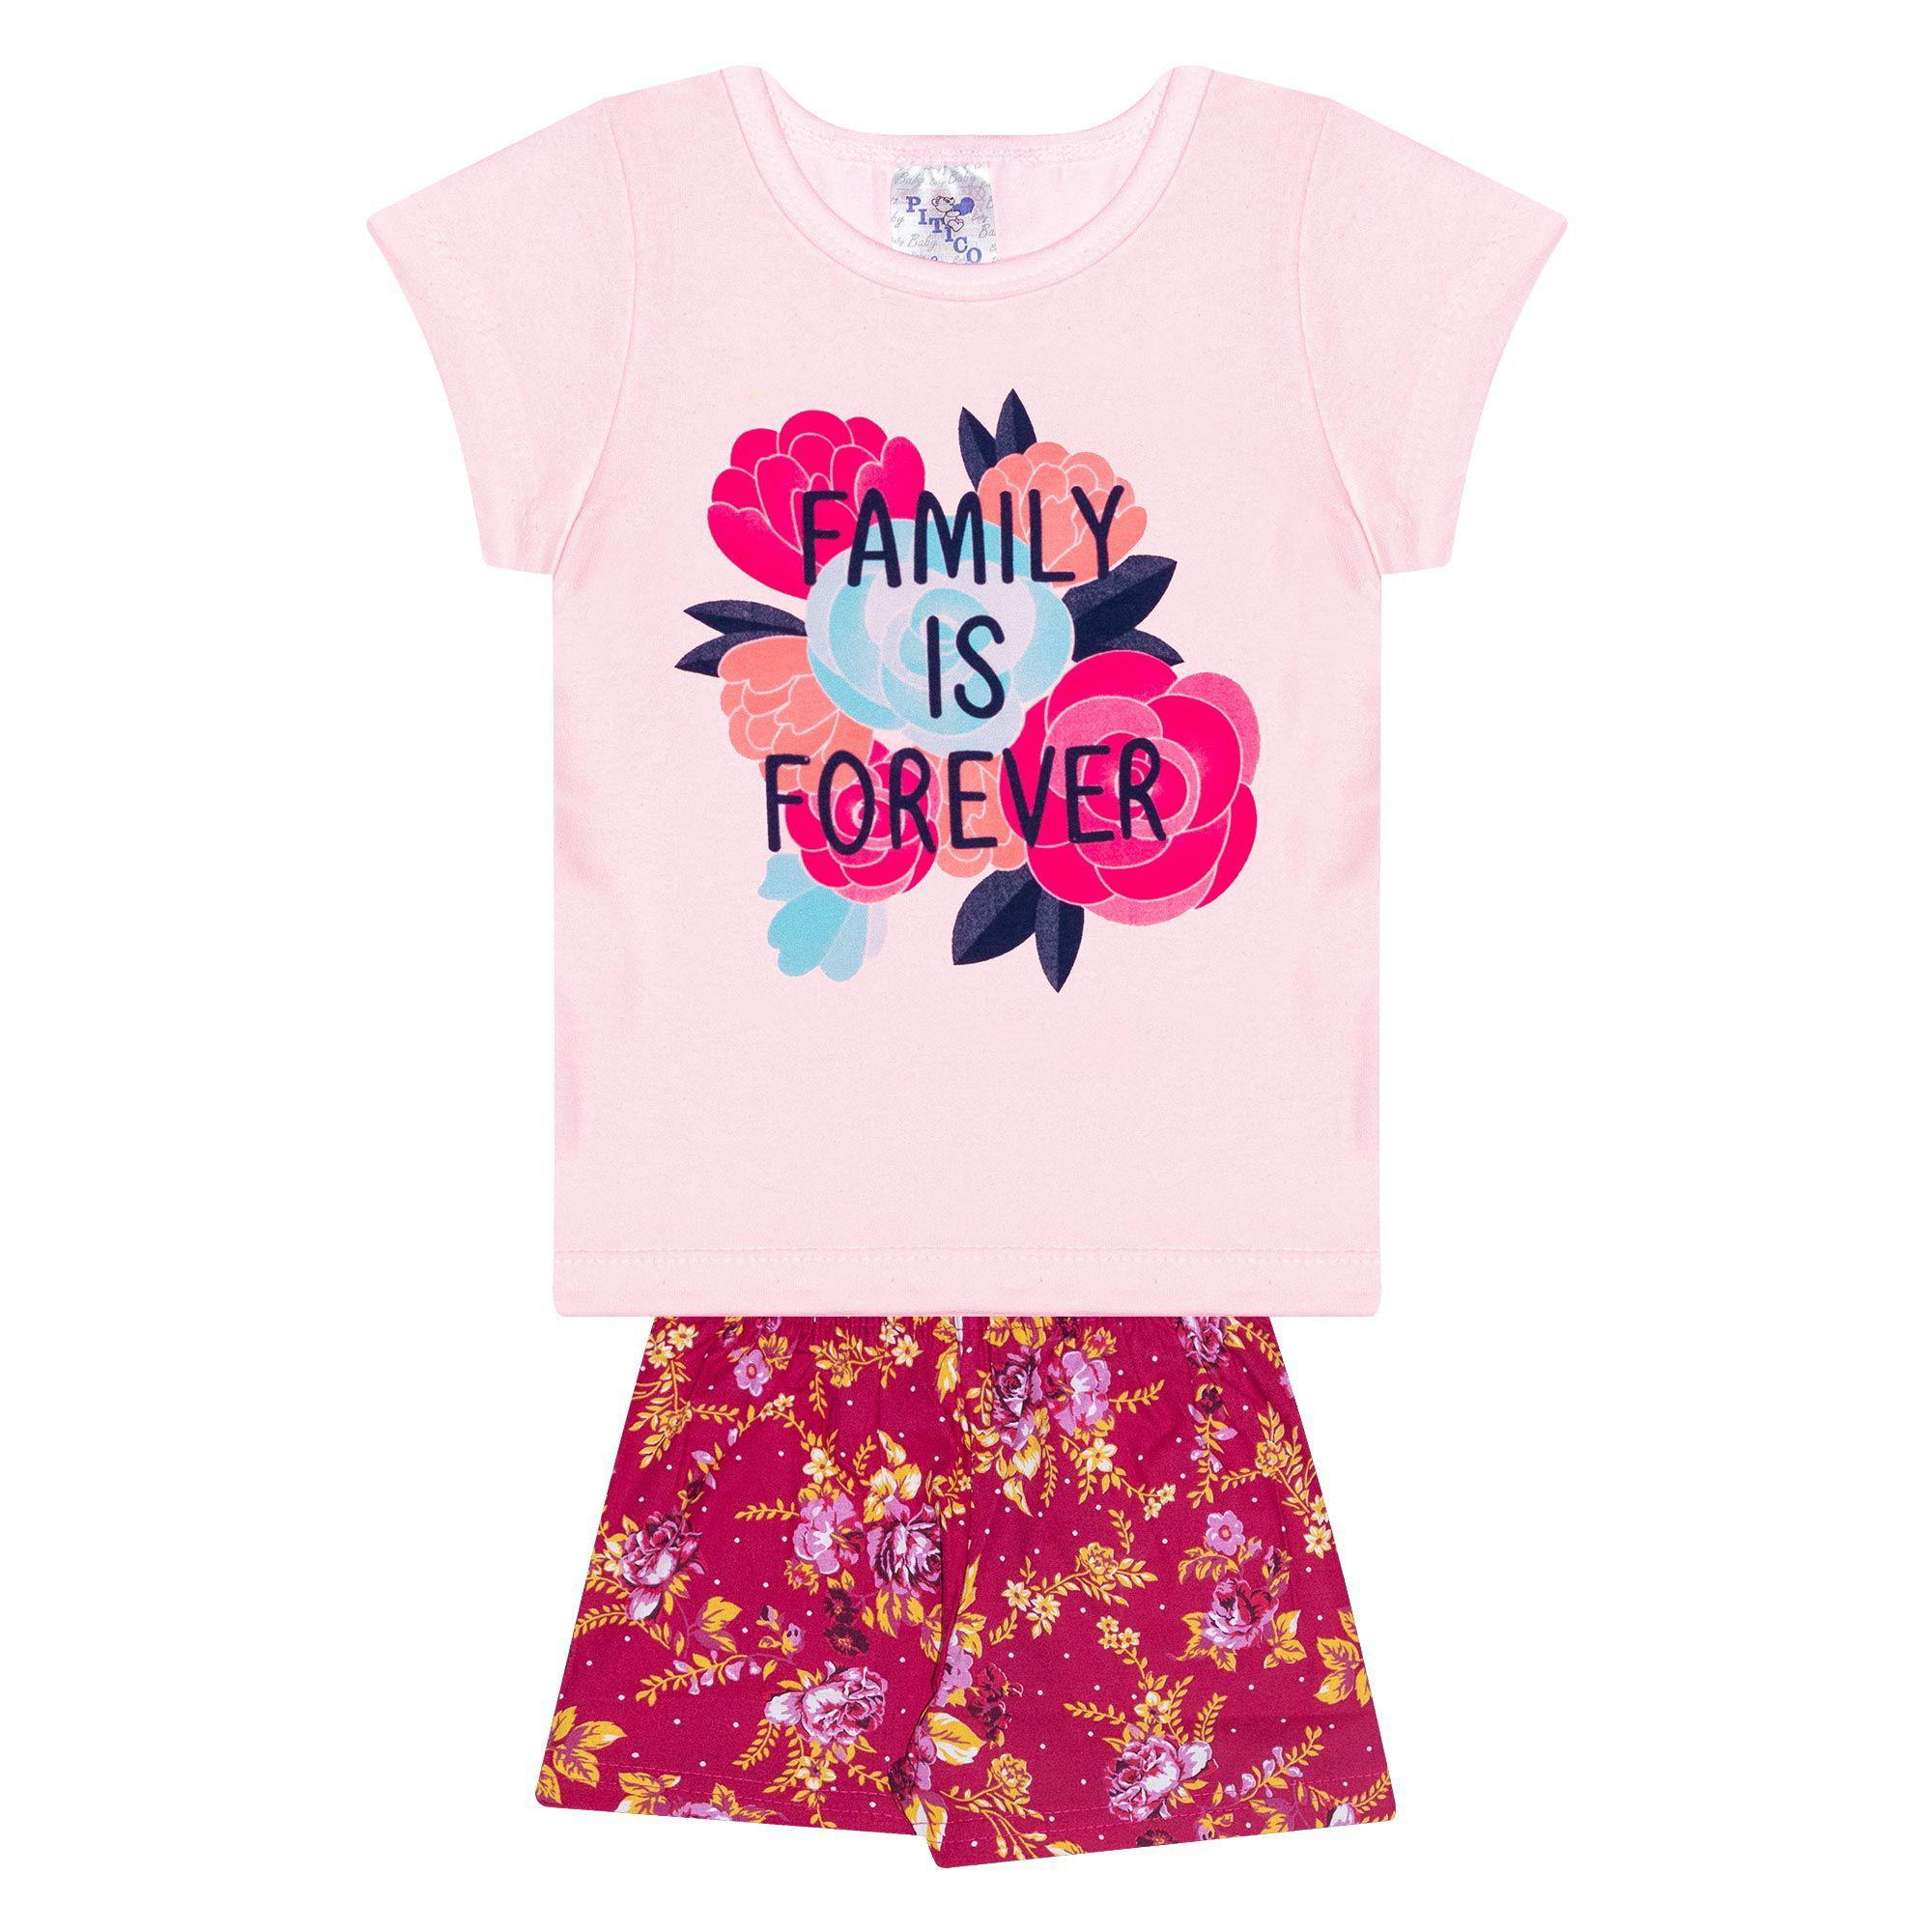 Conjunto Infantil Feminino - Ref 1030 - Rosa/Pink - Pitico